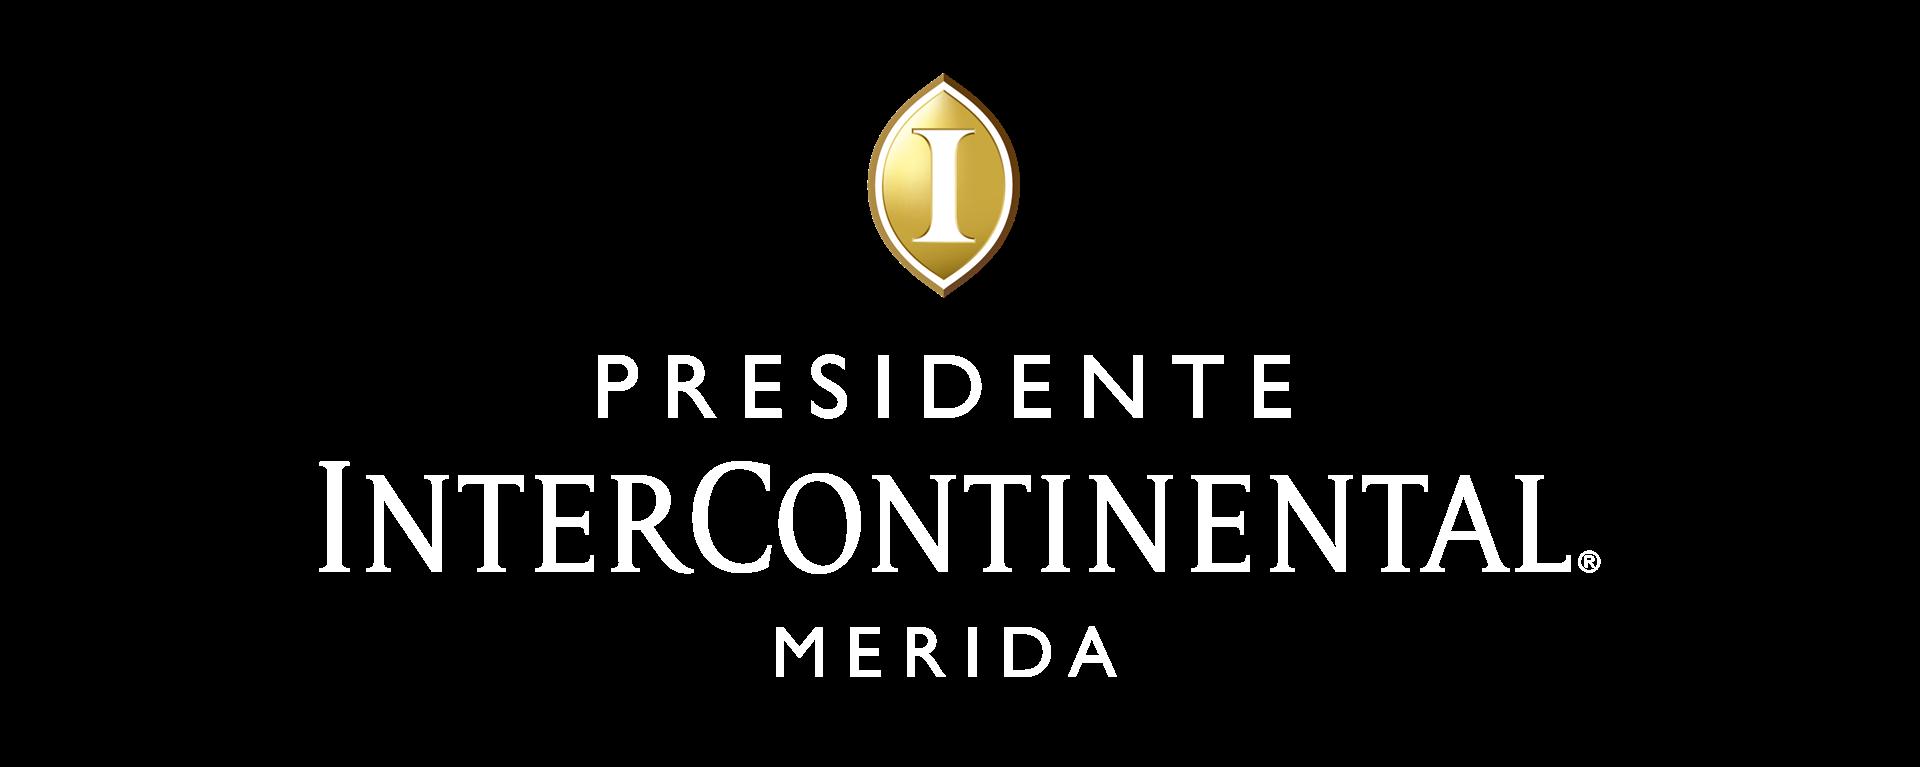 InterContinental Presidente Merida